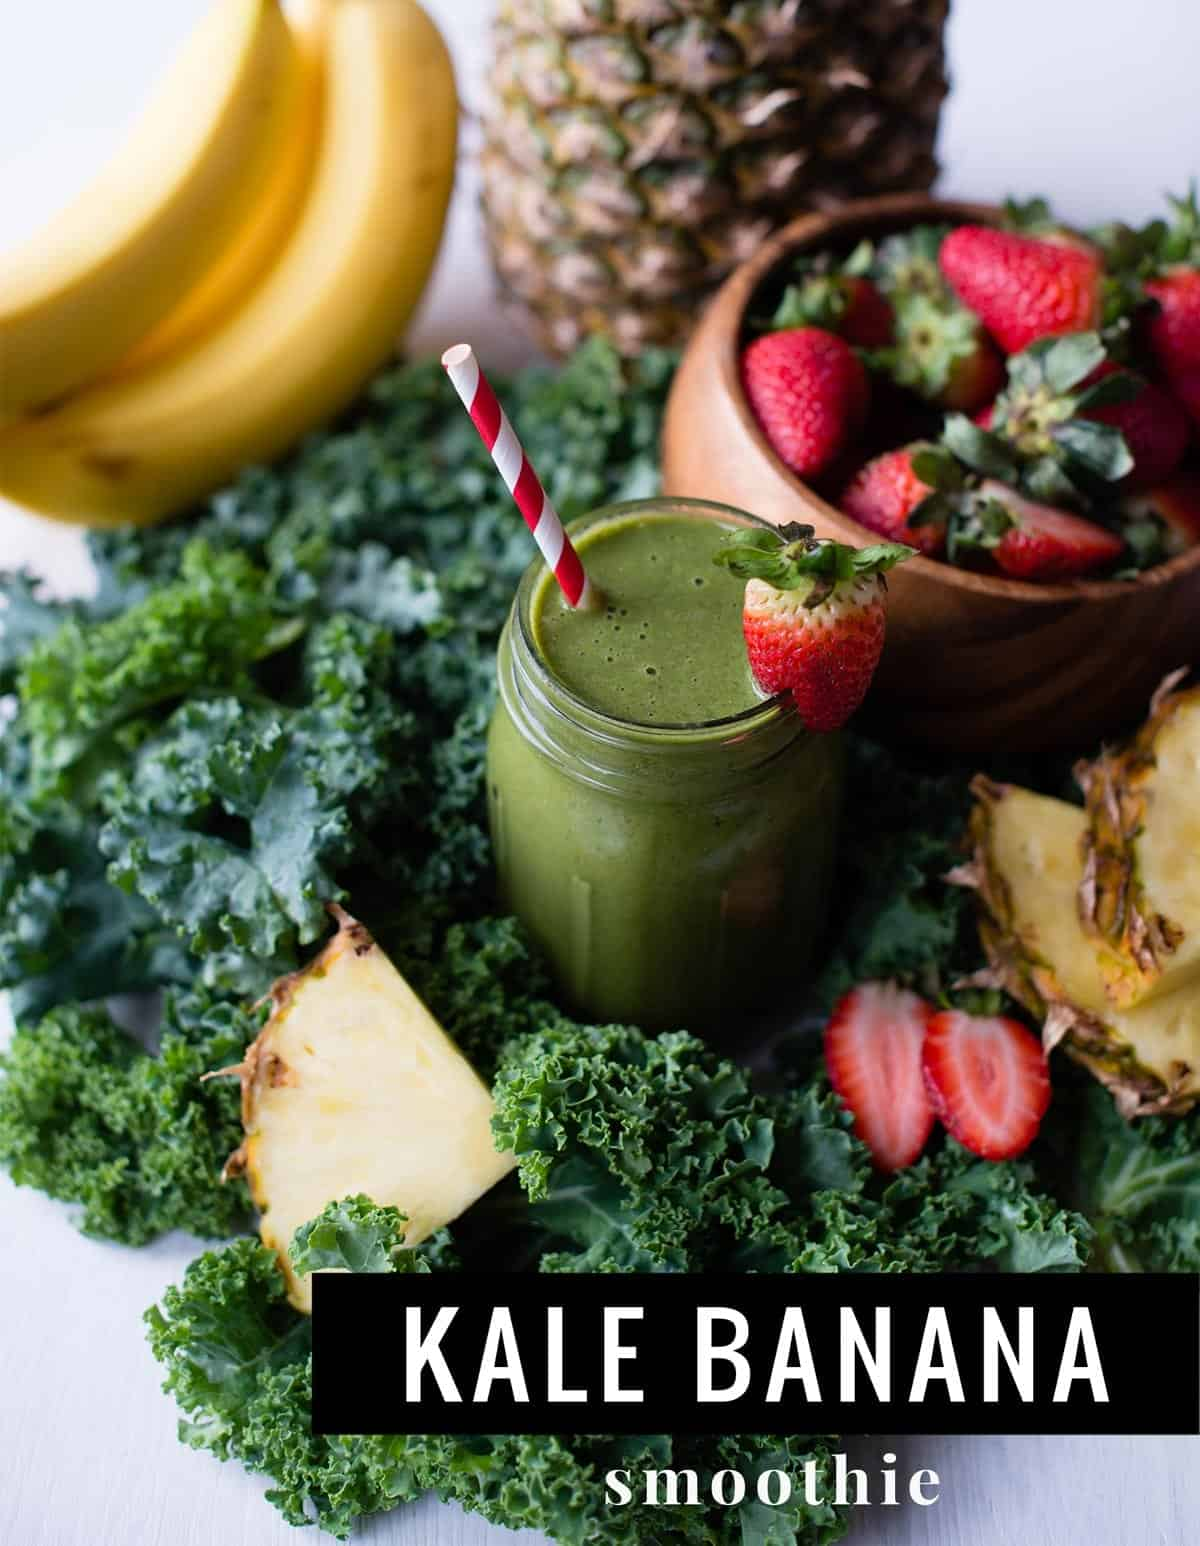 Kale Banana Smoothie   SimpleGreenSmoothies.com #plantbased #vegan #greensmoothie #kalesmoothie